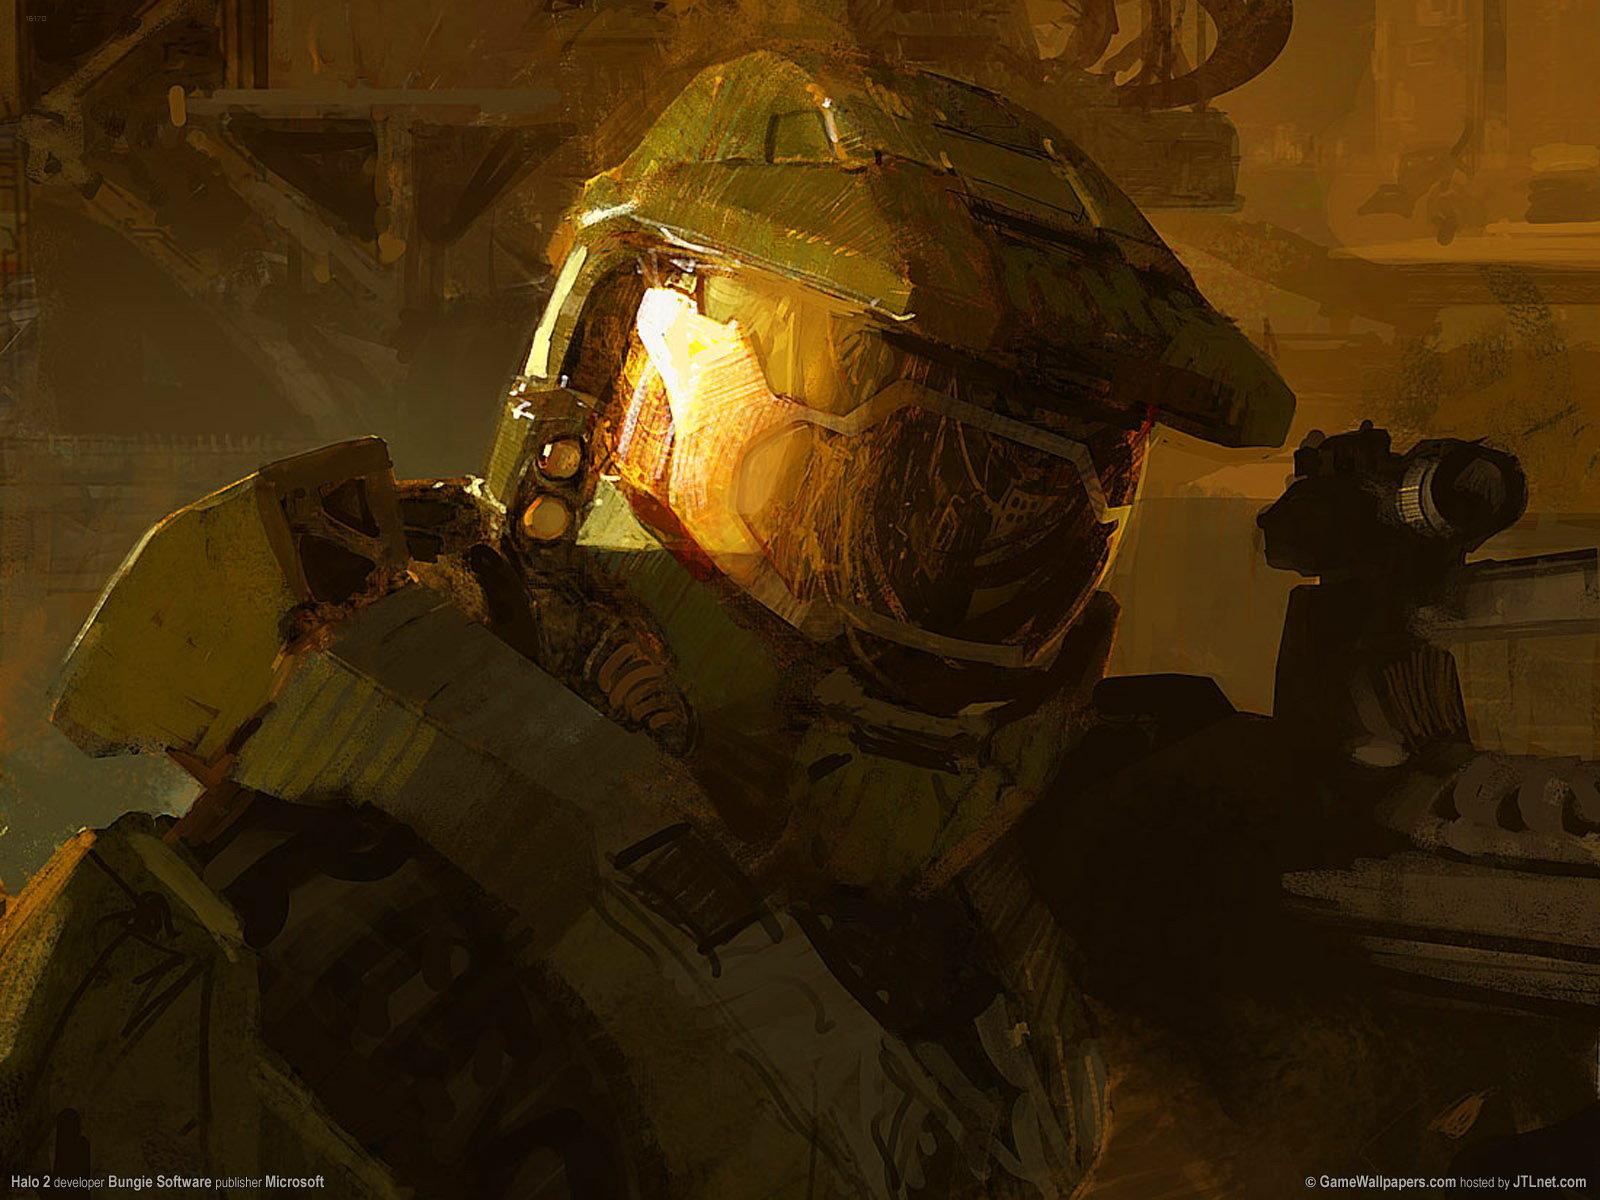 Best Halo 2 Wallpaper ID154894 For High Resolution Hd 1600x1200 Desktop